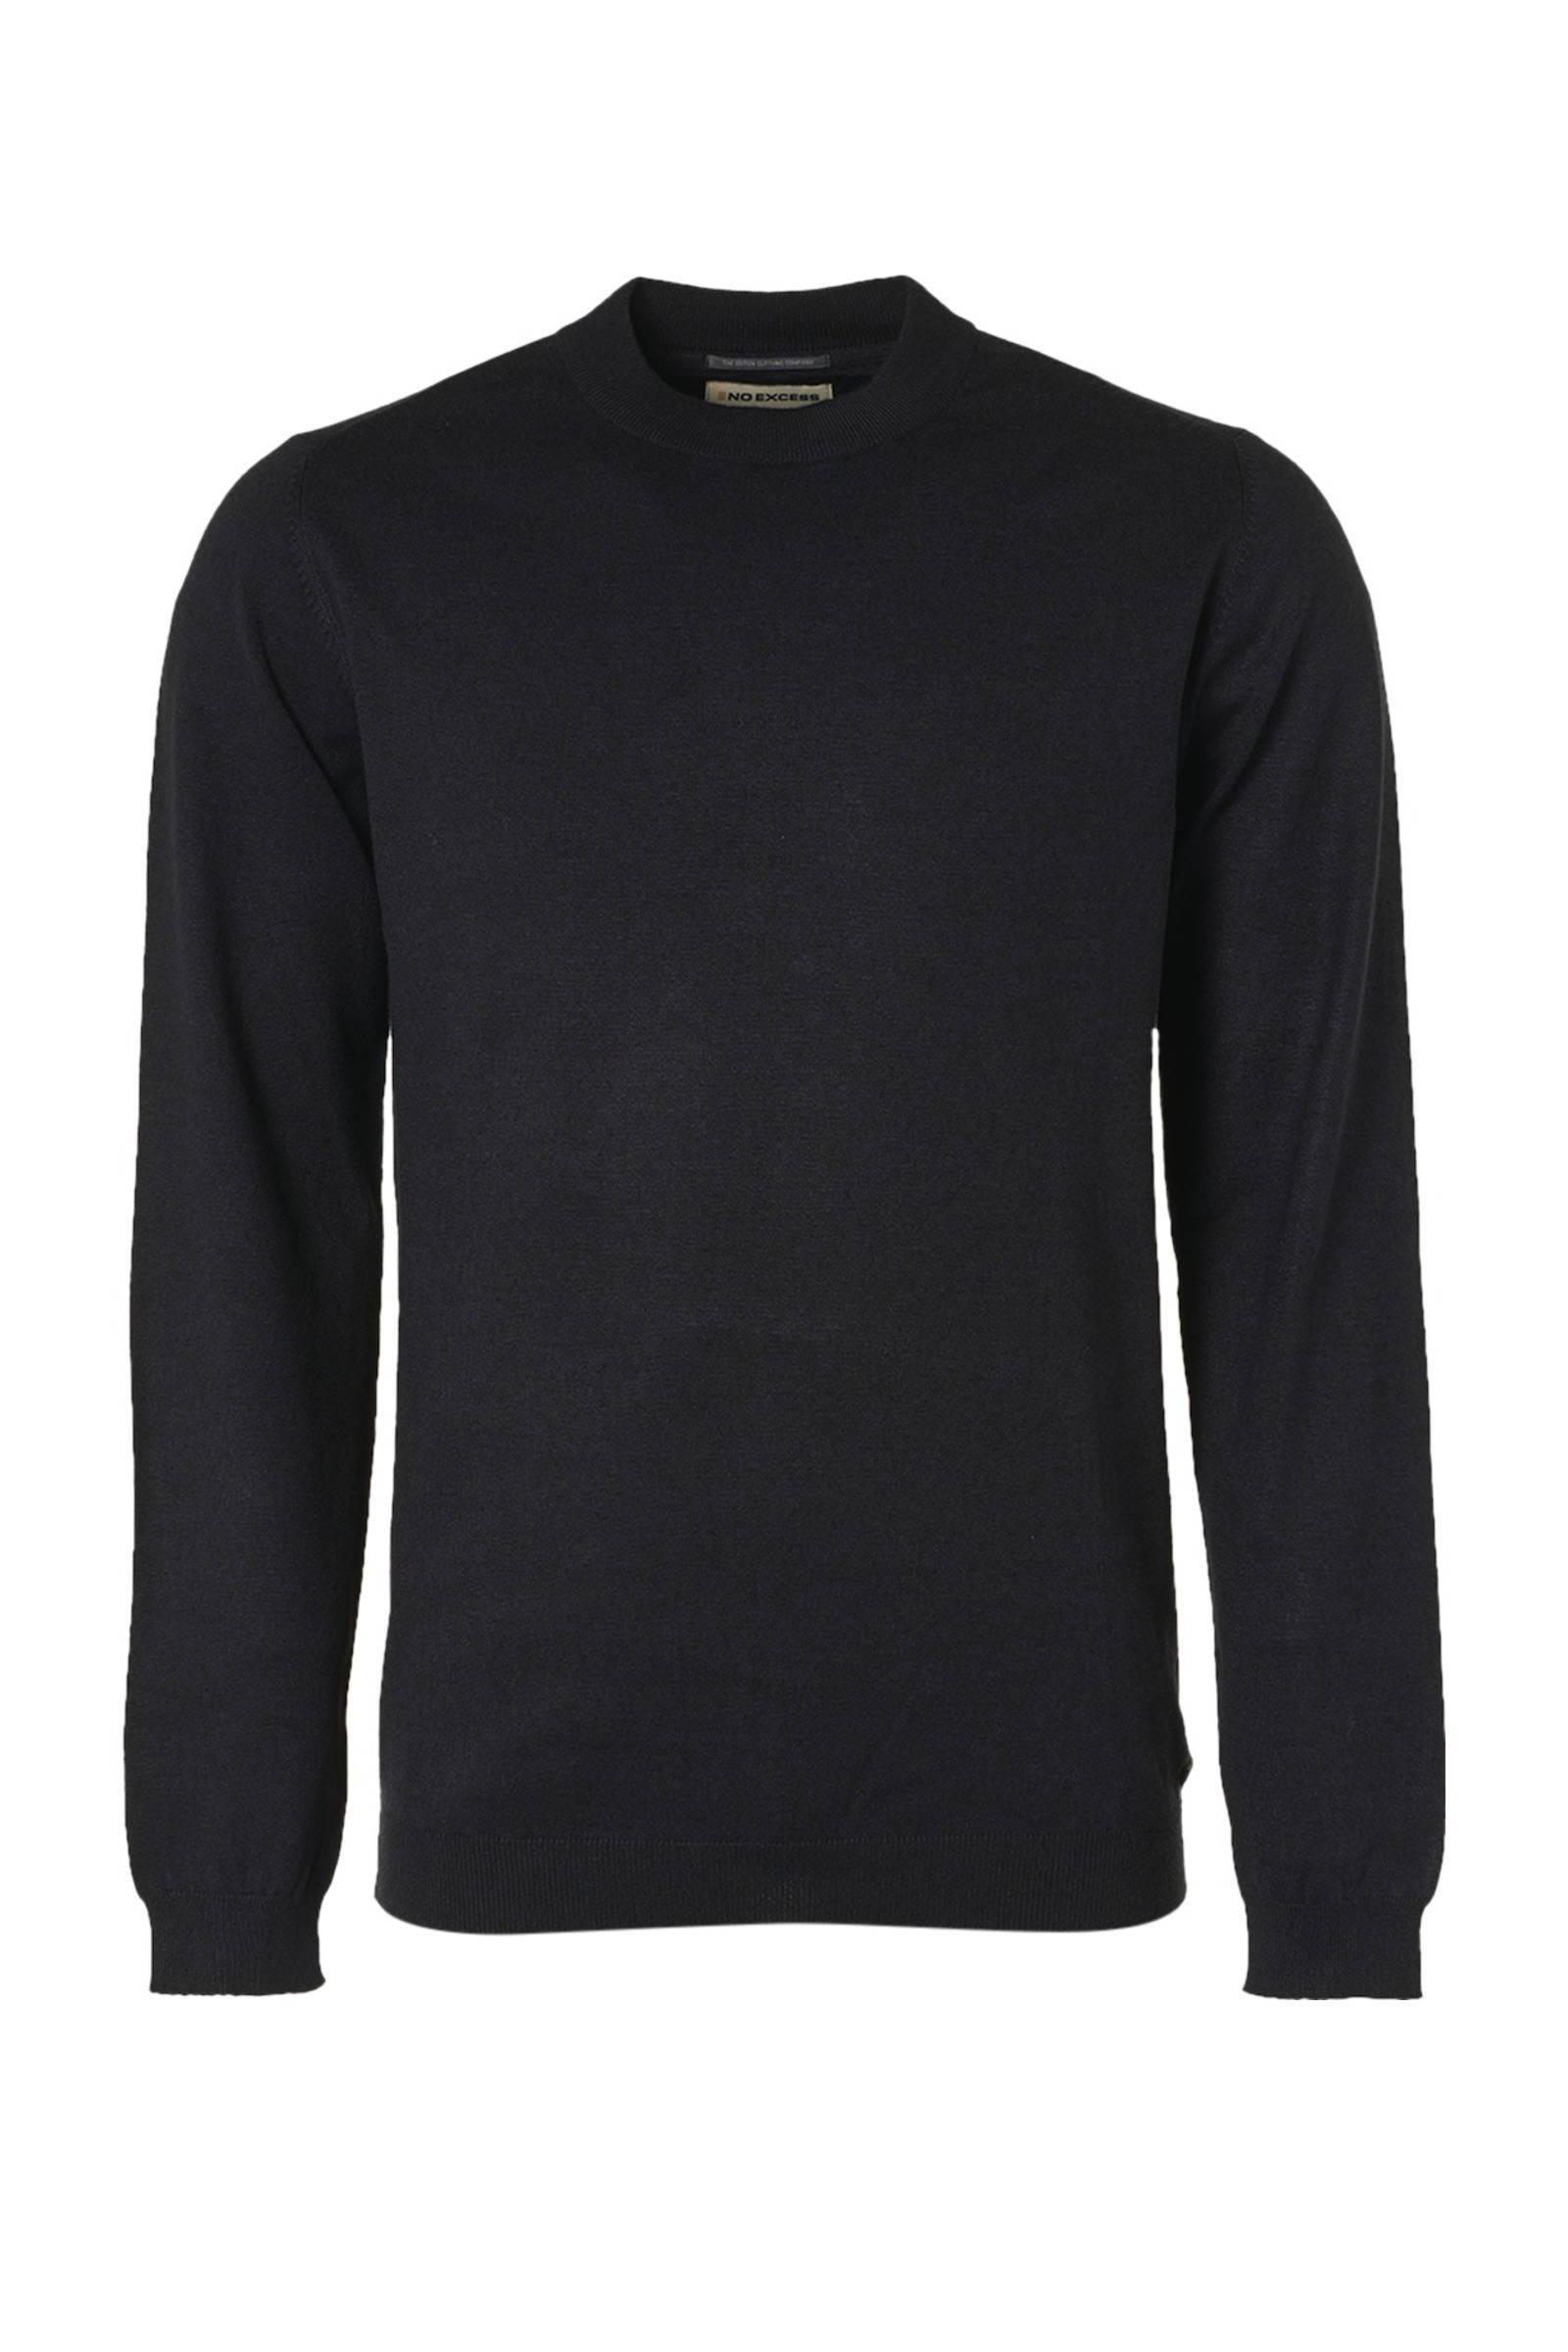 No Excess Pullover high crewneck 2 color black online kopen